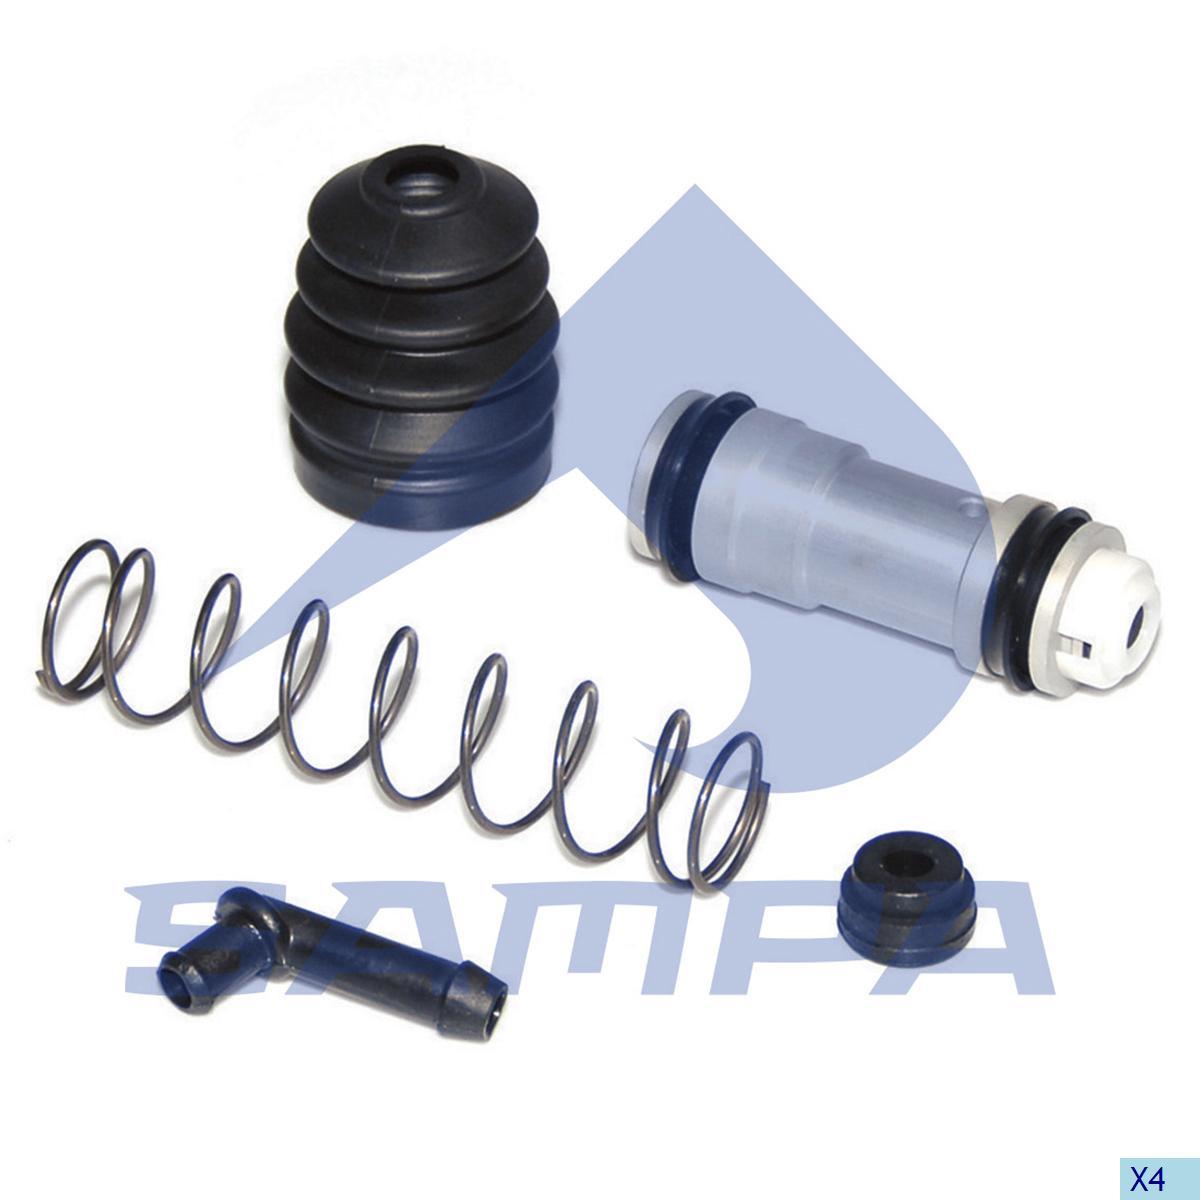 Repair Kit, Main Cylinder, Mercedes, Clutch